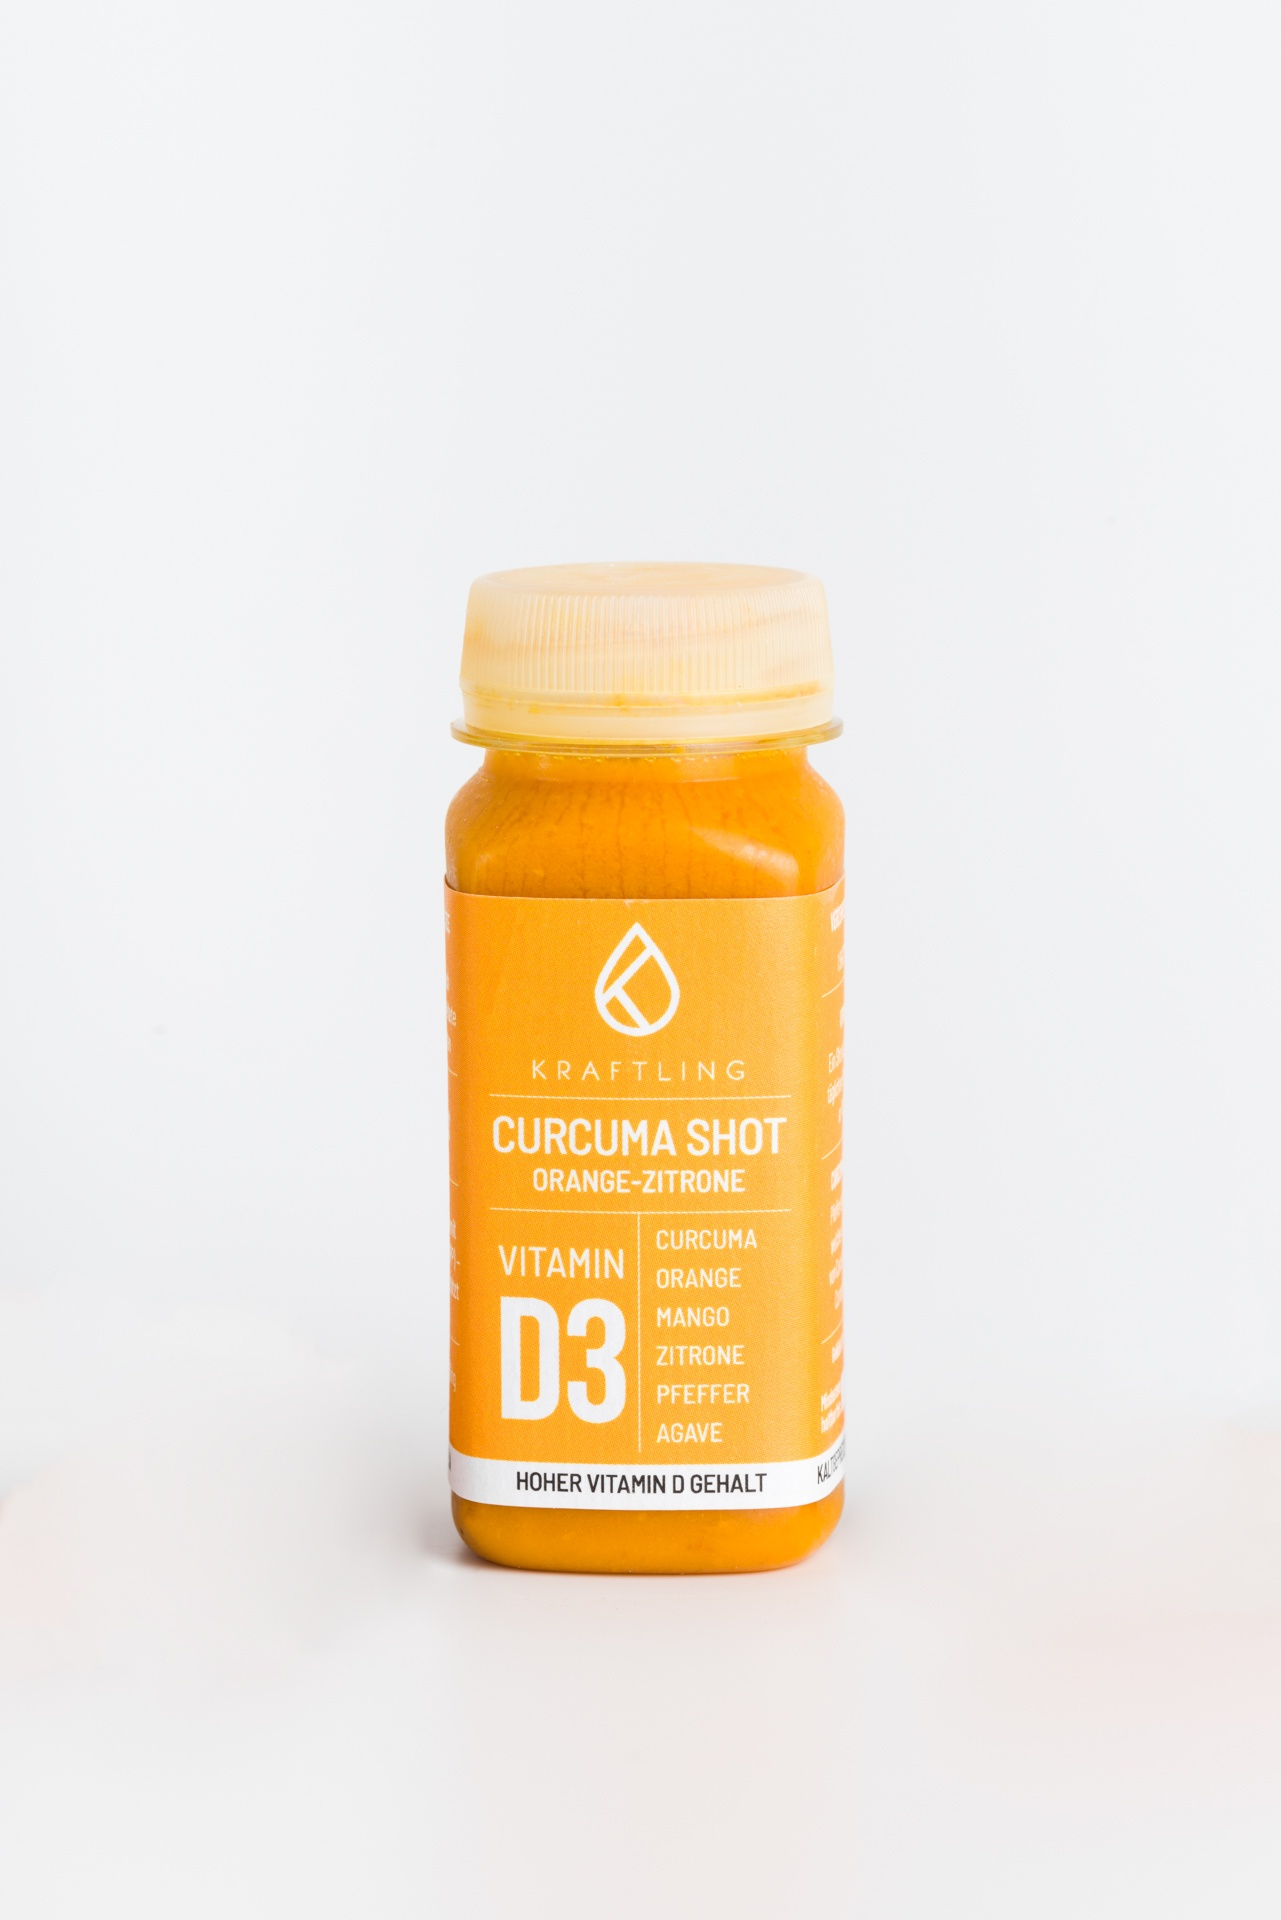 Curcuma shot Orange Zitrone Kraftling Produktbild